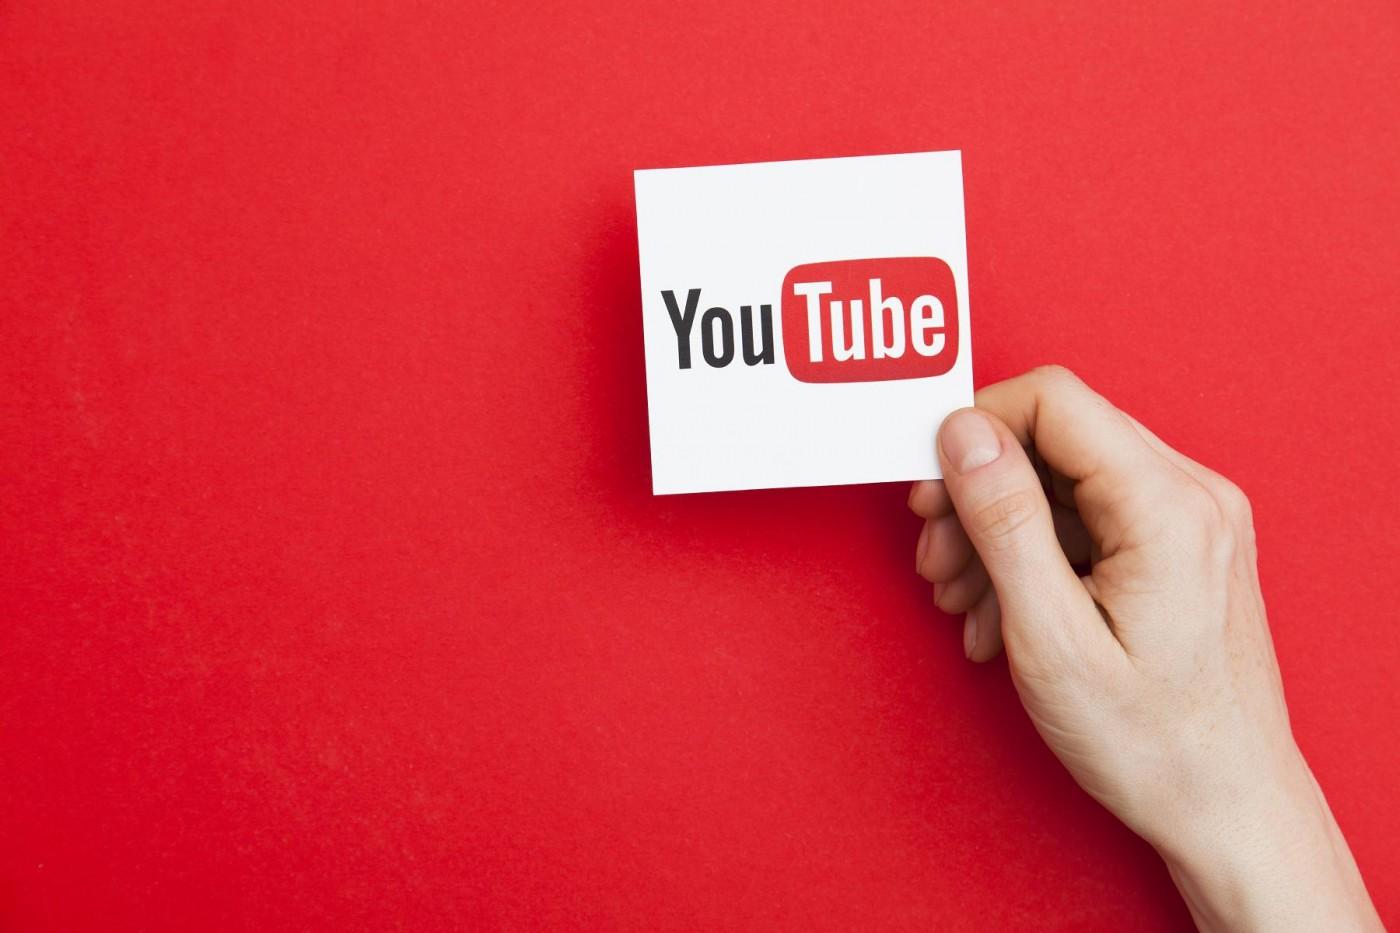 YouTube知名音樂頻道Vevo遭駭,史上最高點閱率神曲一度消失